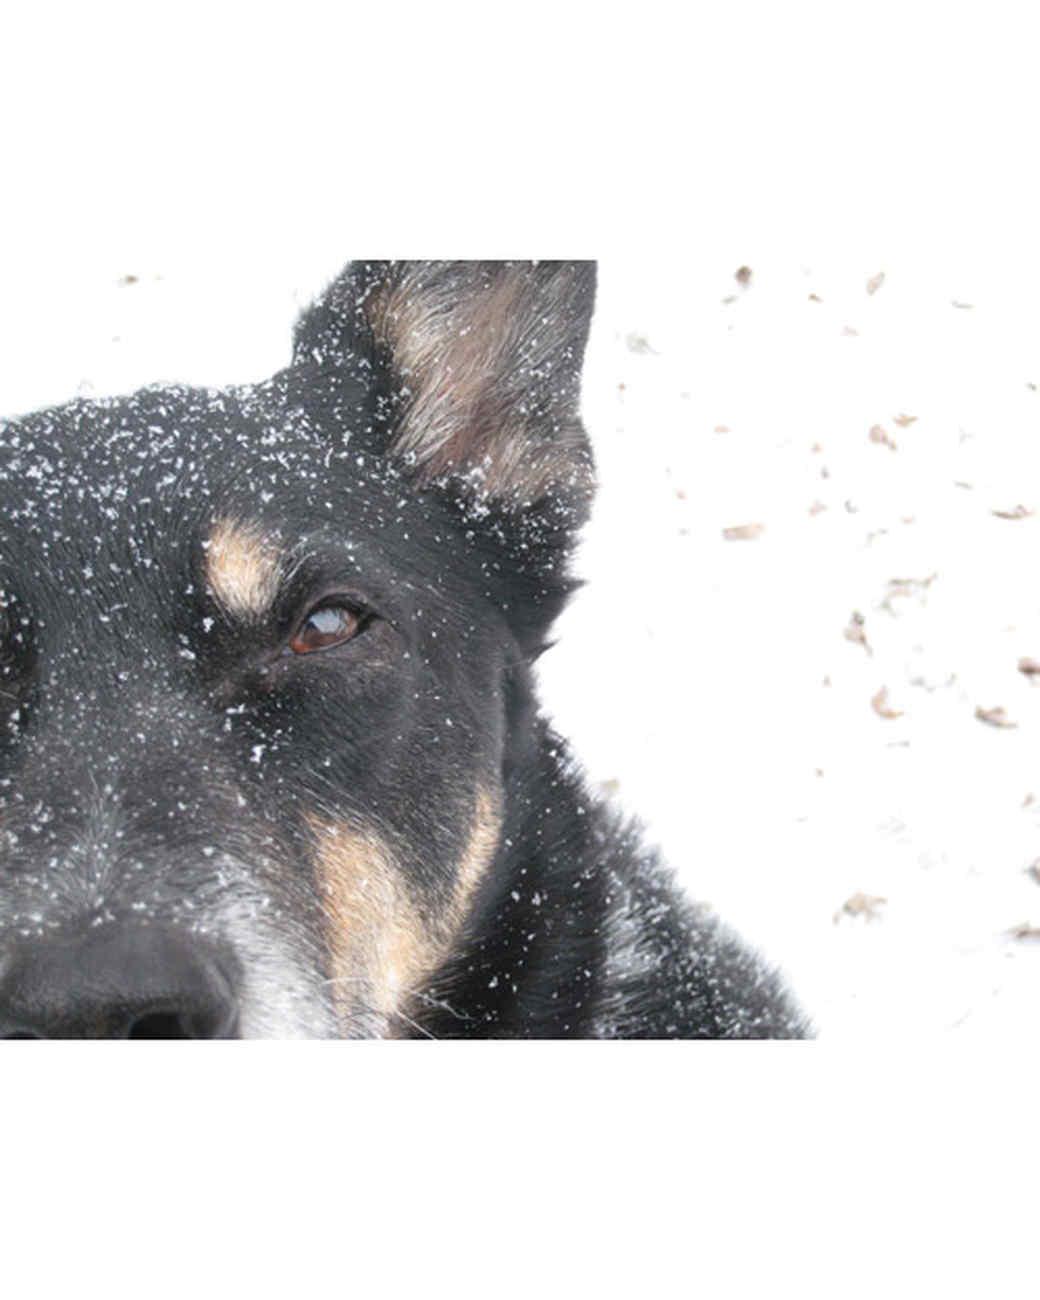 pets_snowangels_7084715_122717_18936856.jpg